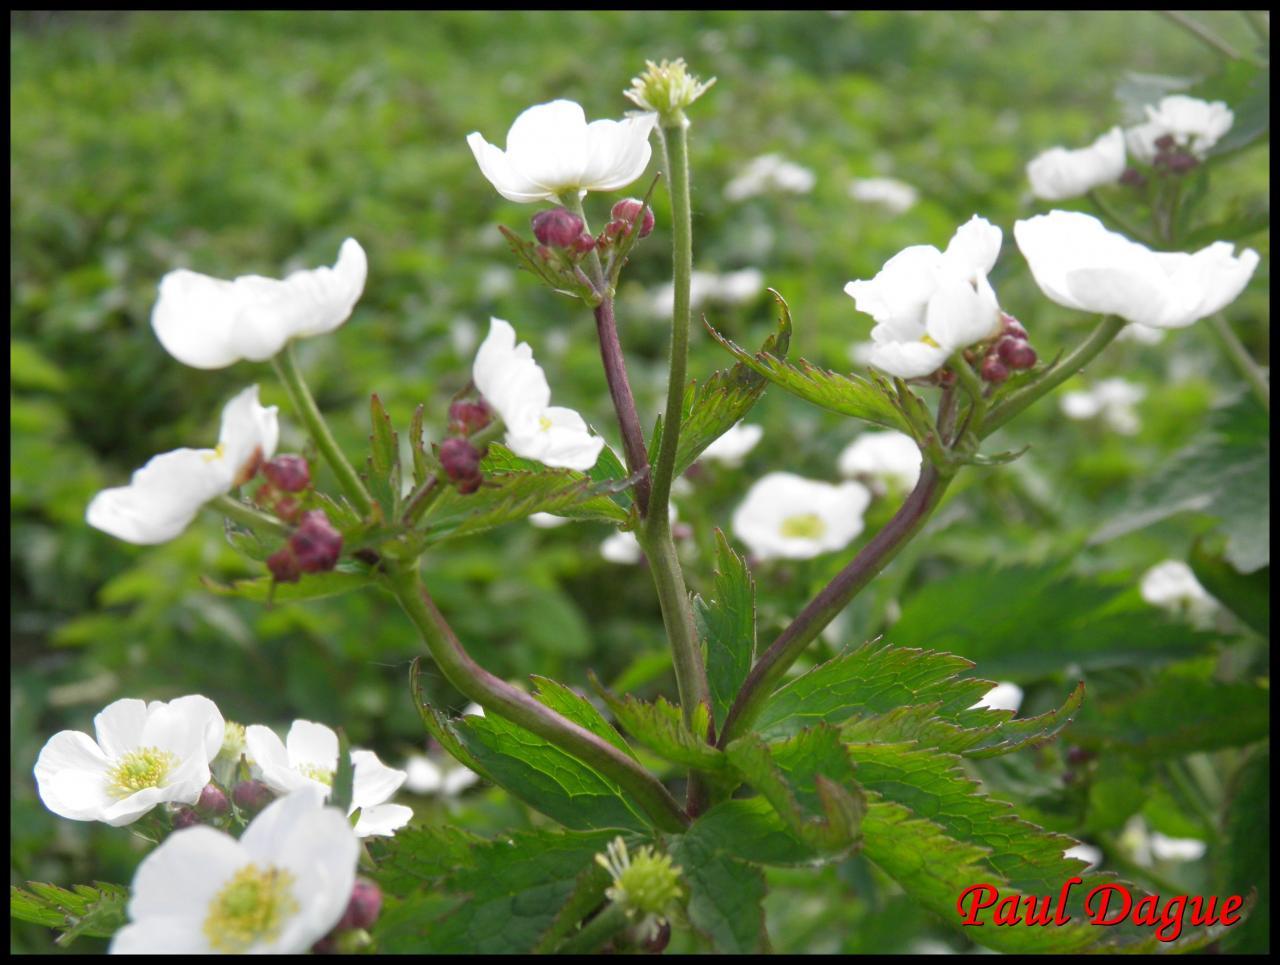 renoncule à feuilles d'aconit-ranunculus aconitifolius-ranunculacée